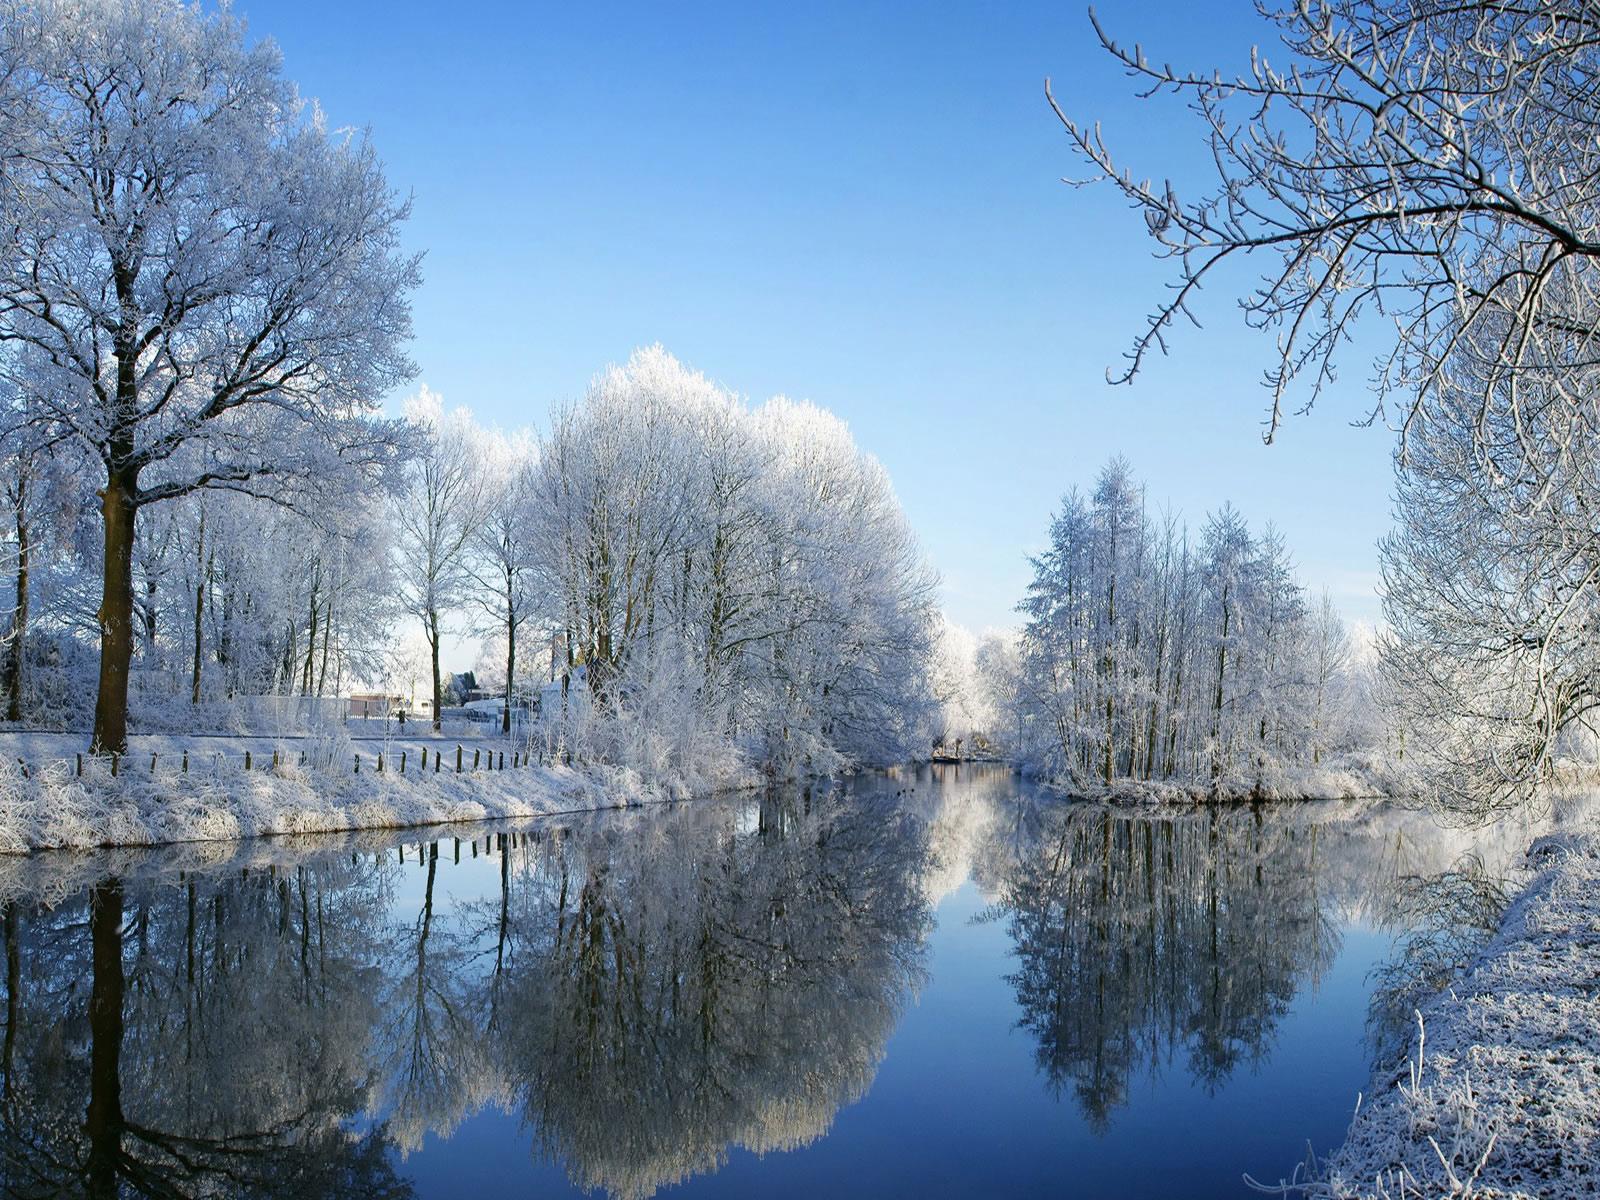 Winter desktop wallpapers free download hd wallpapers pop 1600x1200 voltagebd Image collections